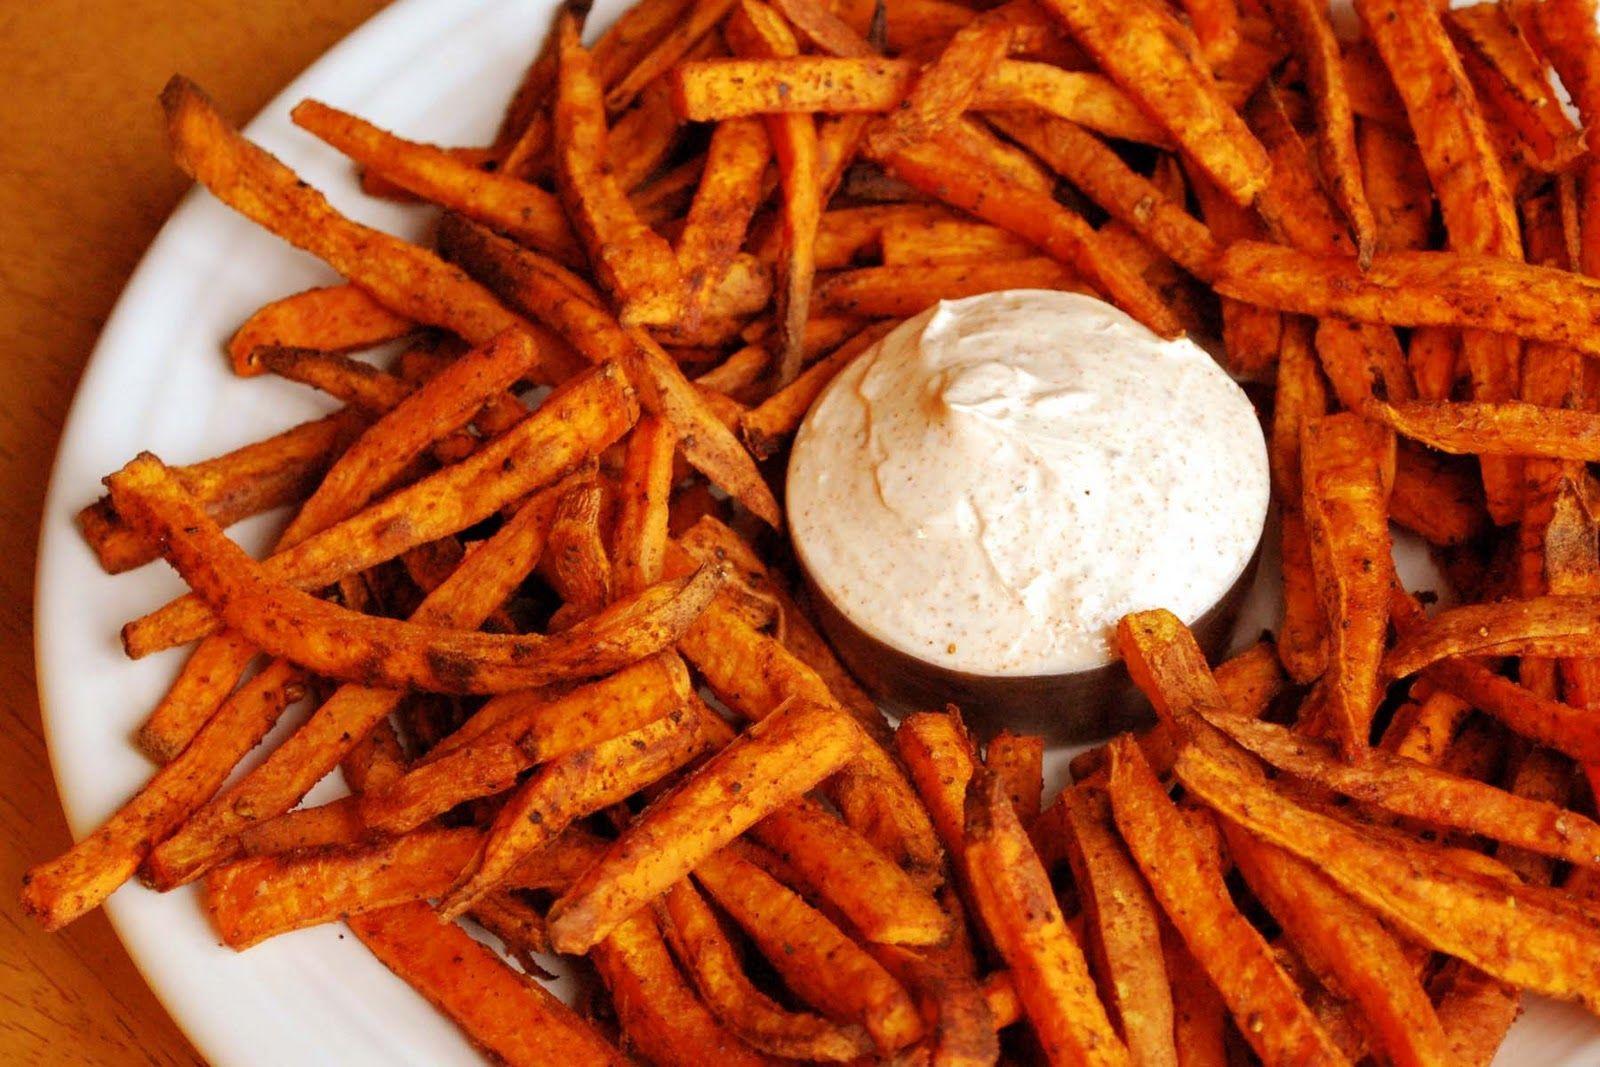 Sweet Potato Fries Recipes  Sweet potato fries recipe All recipes UK